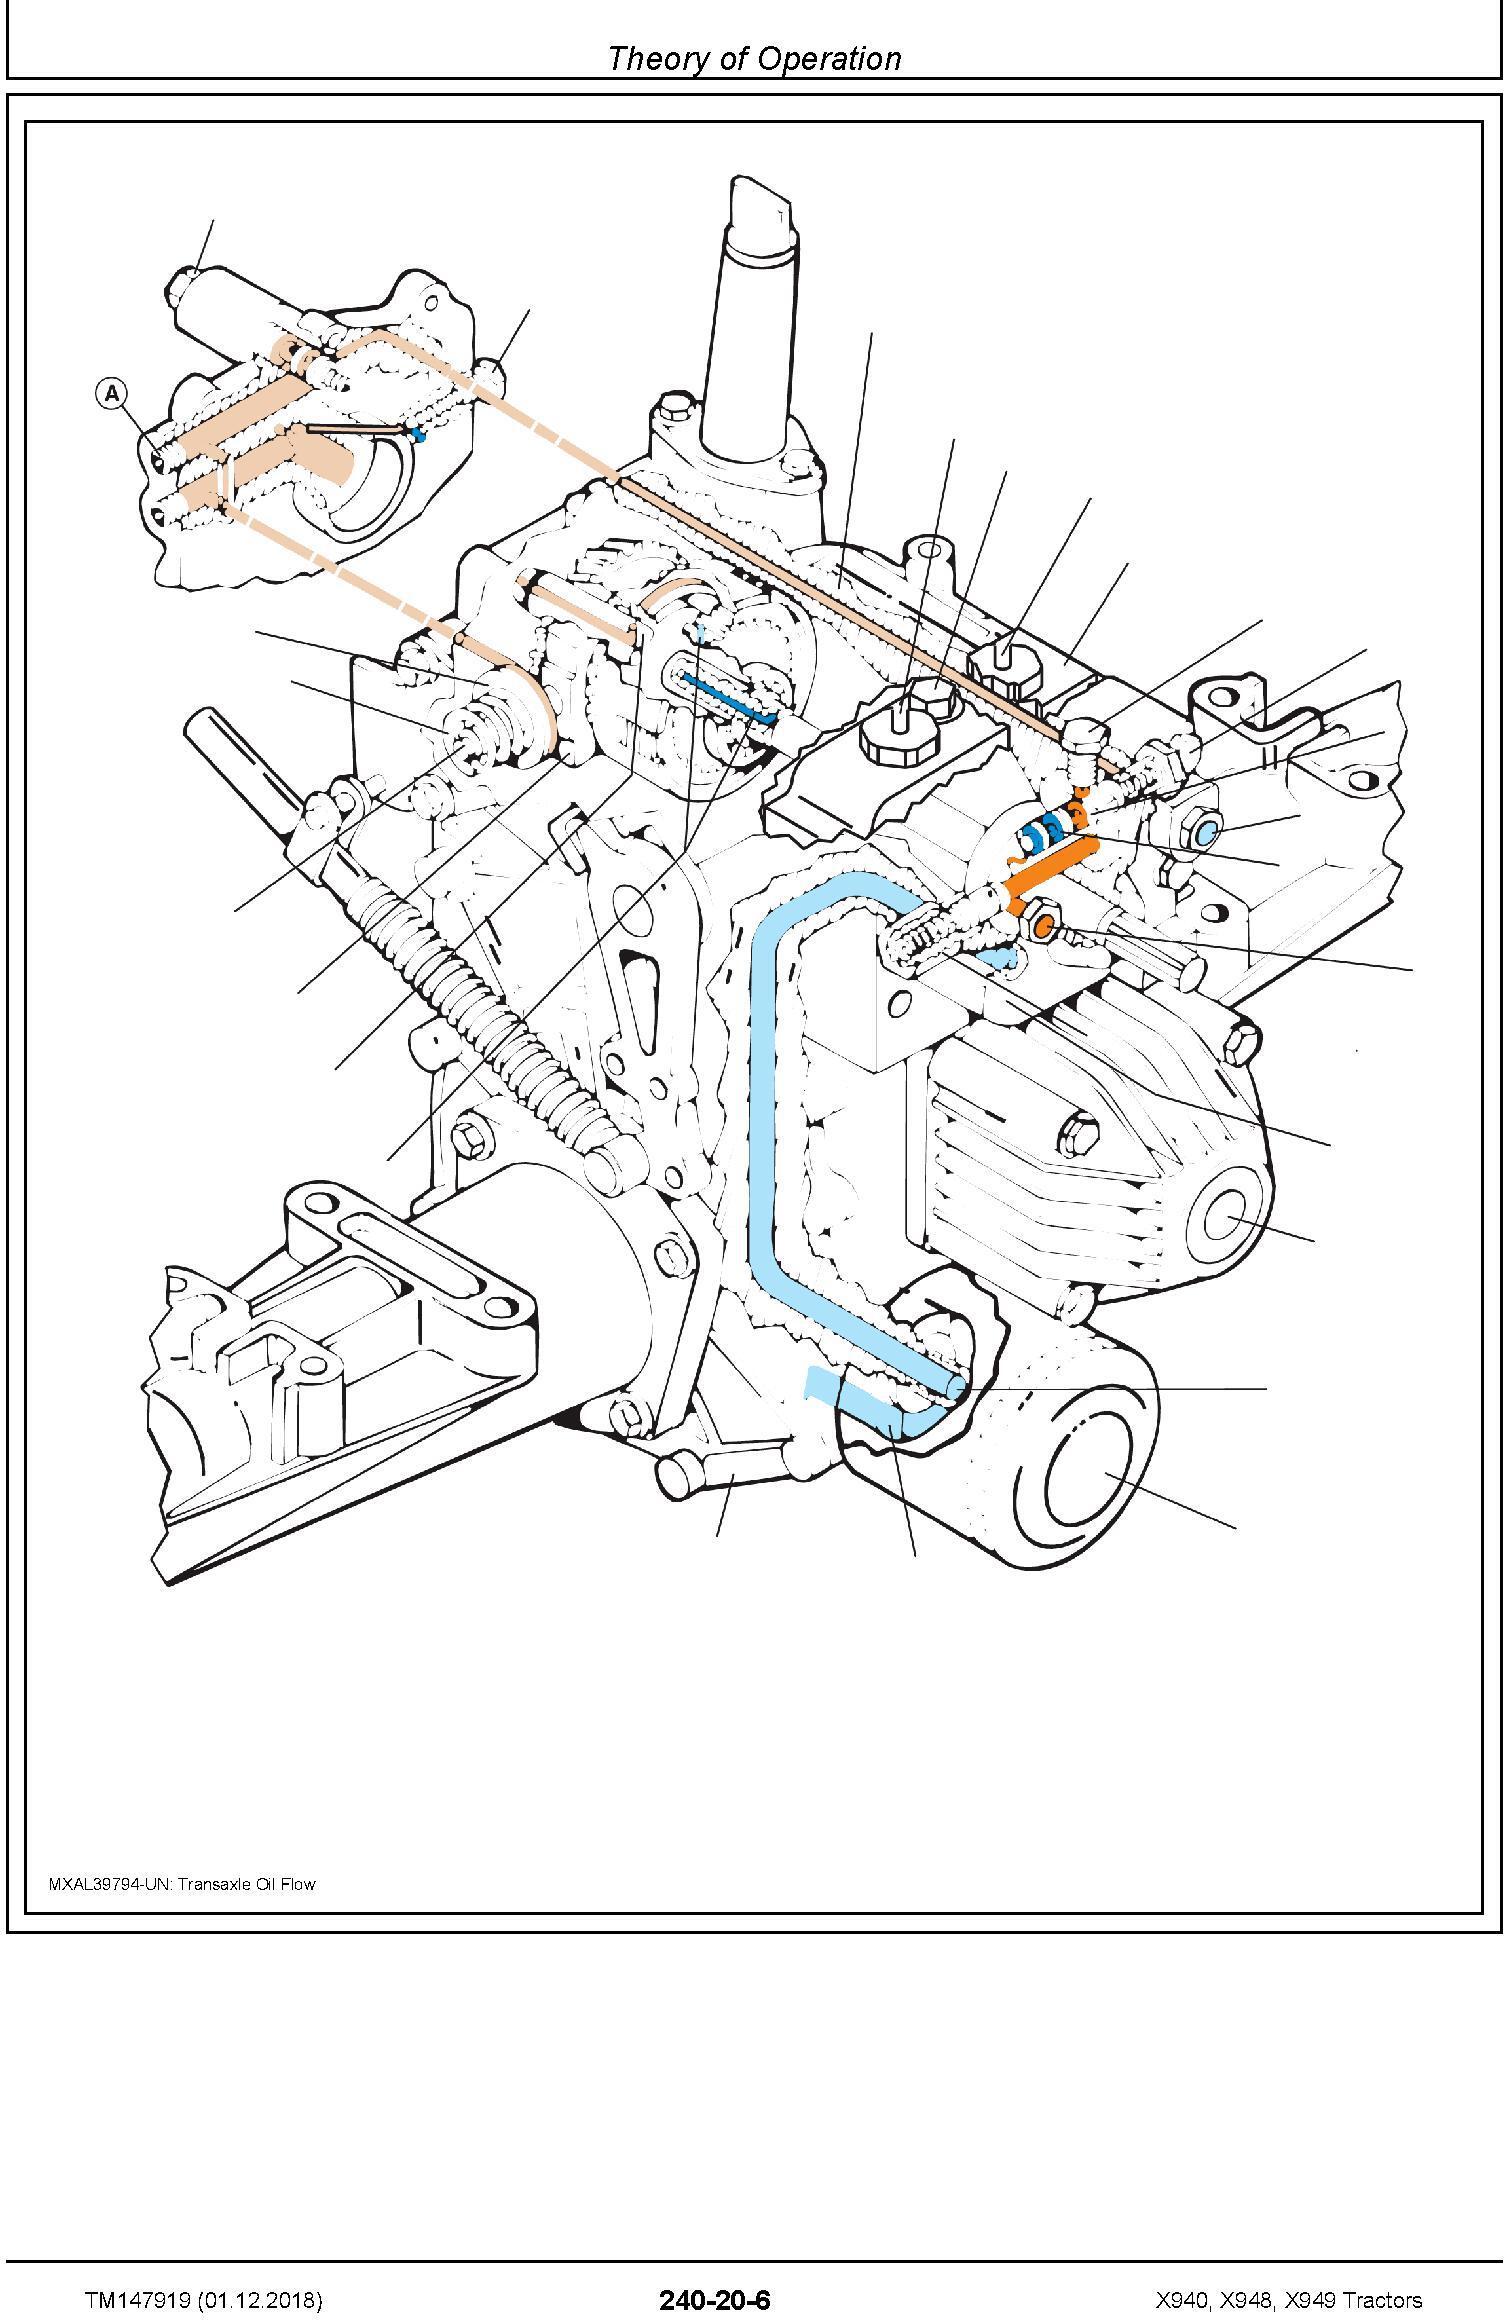 John Deere X940, X948, X949 Compact Utility Tractors (SN